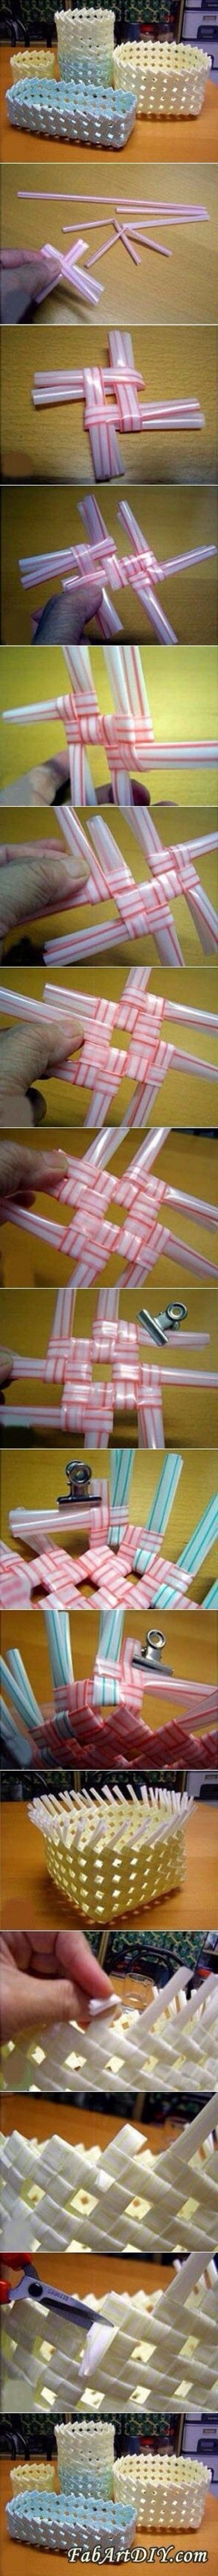 Straw baskets. Plastic drinking straws. People amaze me.